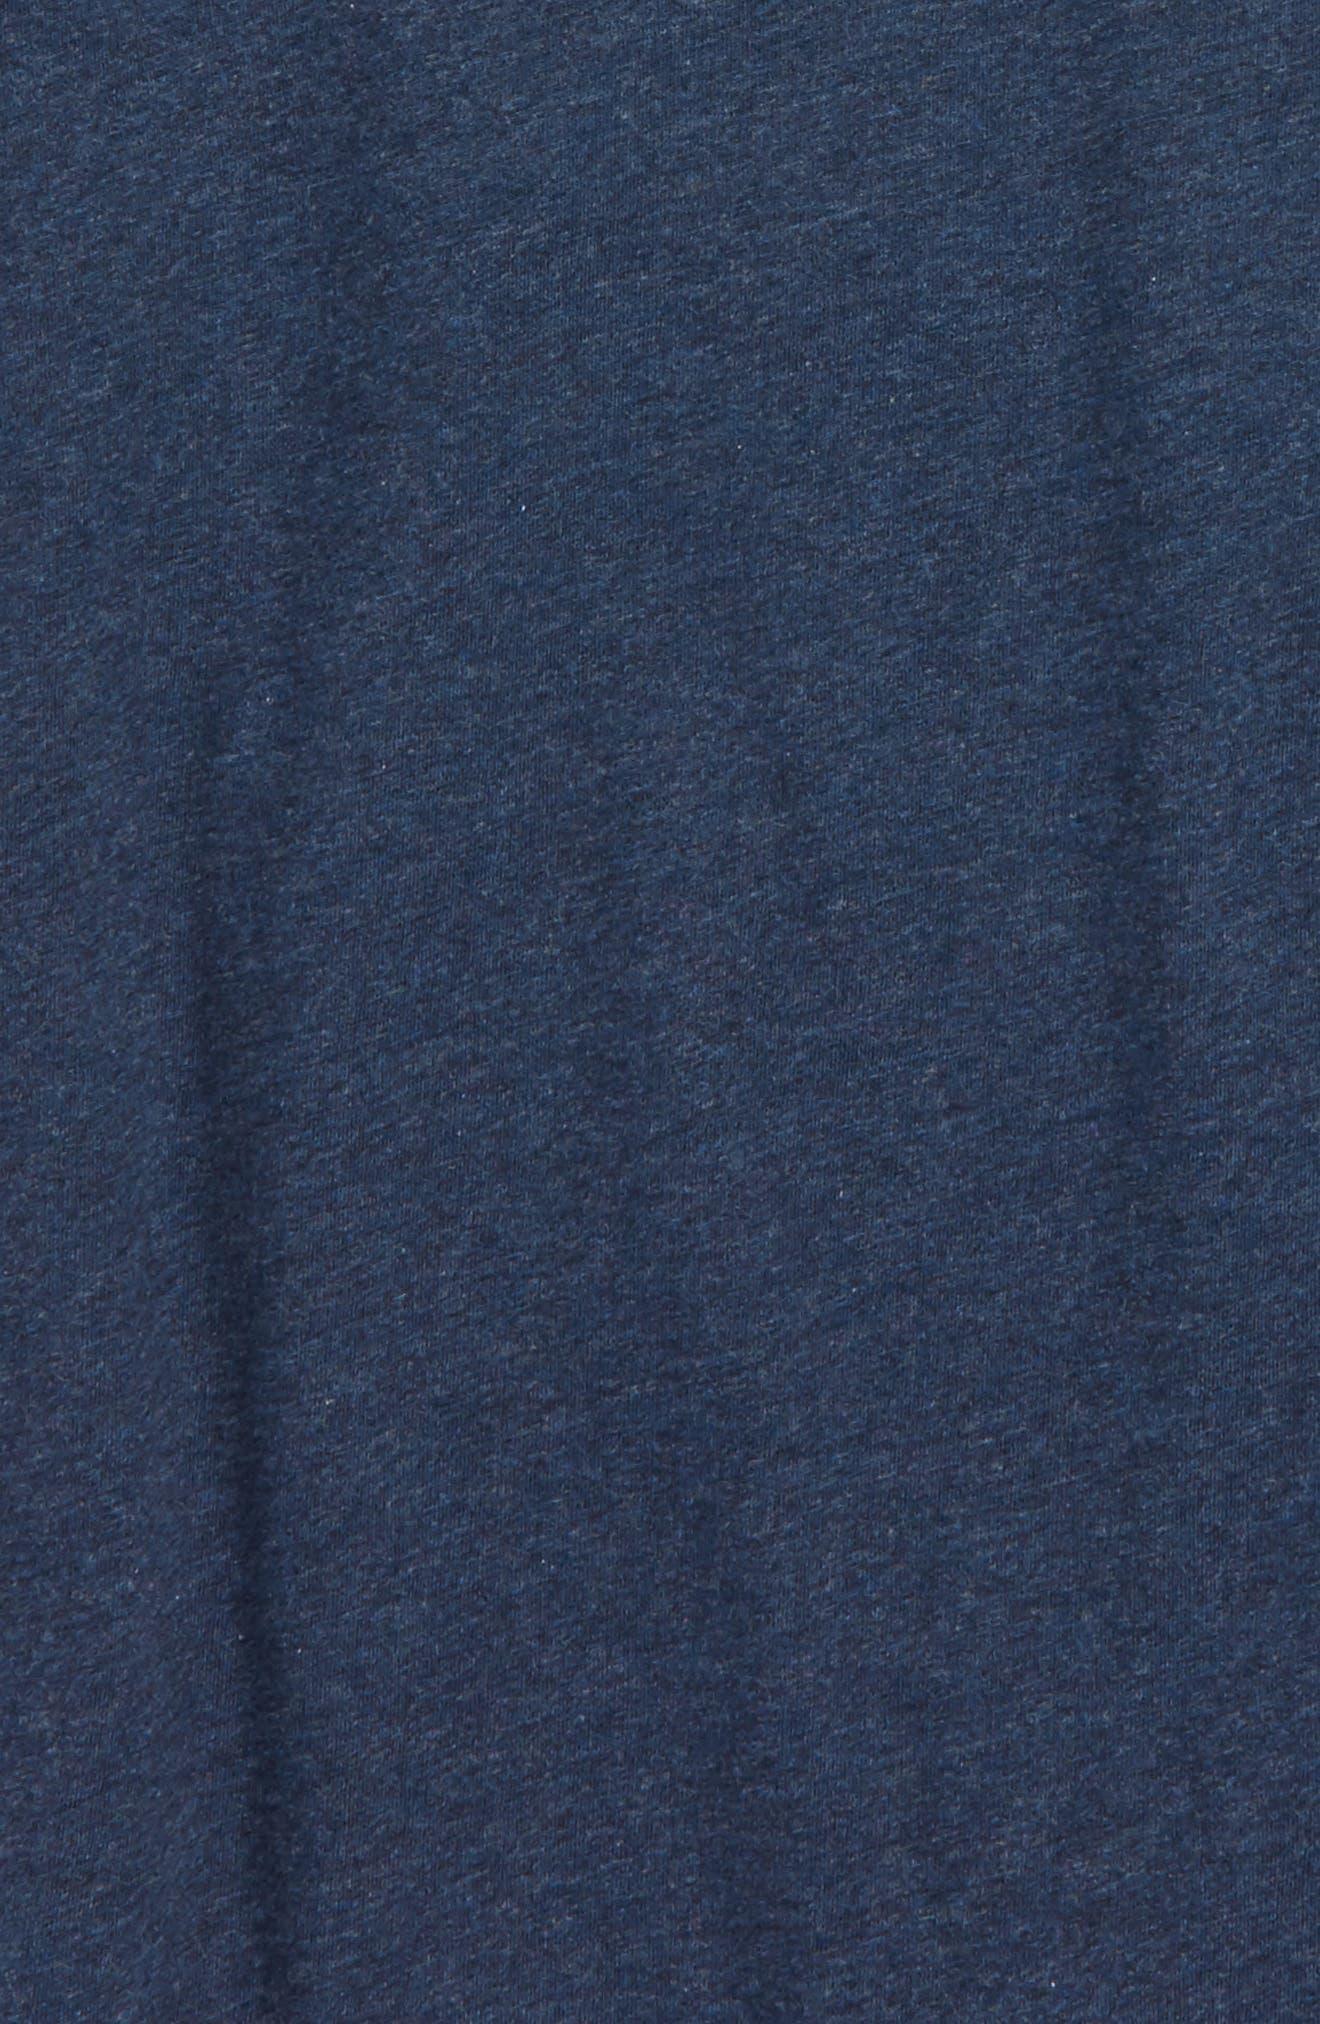 V-Neck T-Shirt,                             Alternate thumbnail 62, color,